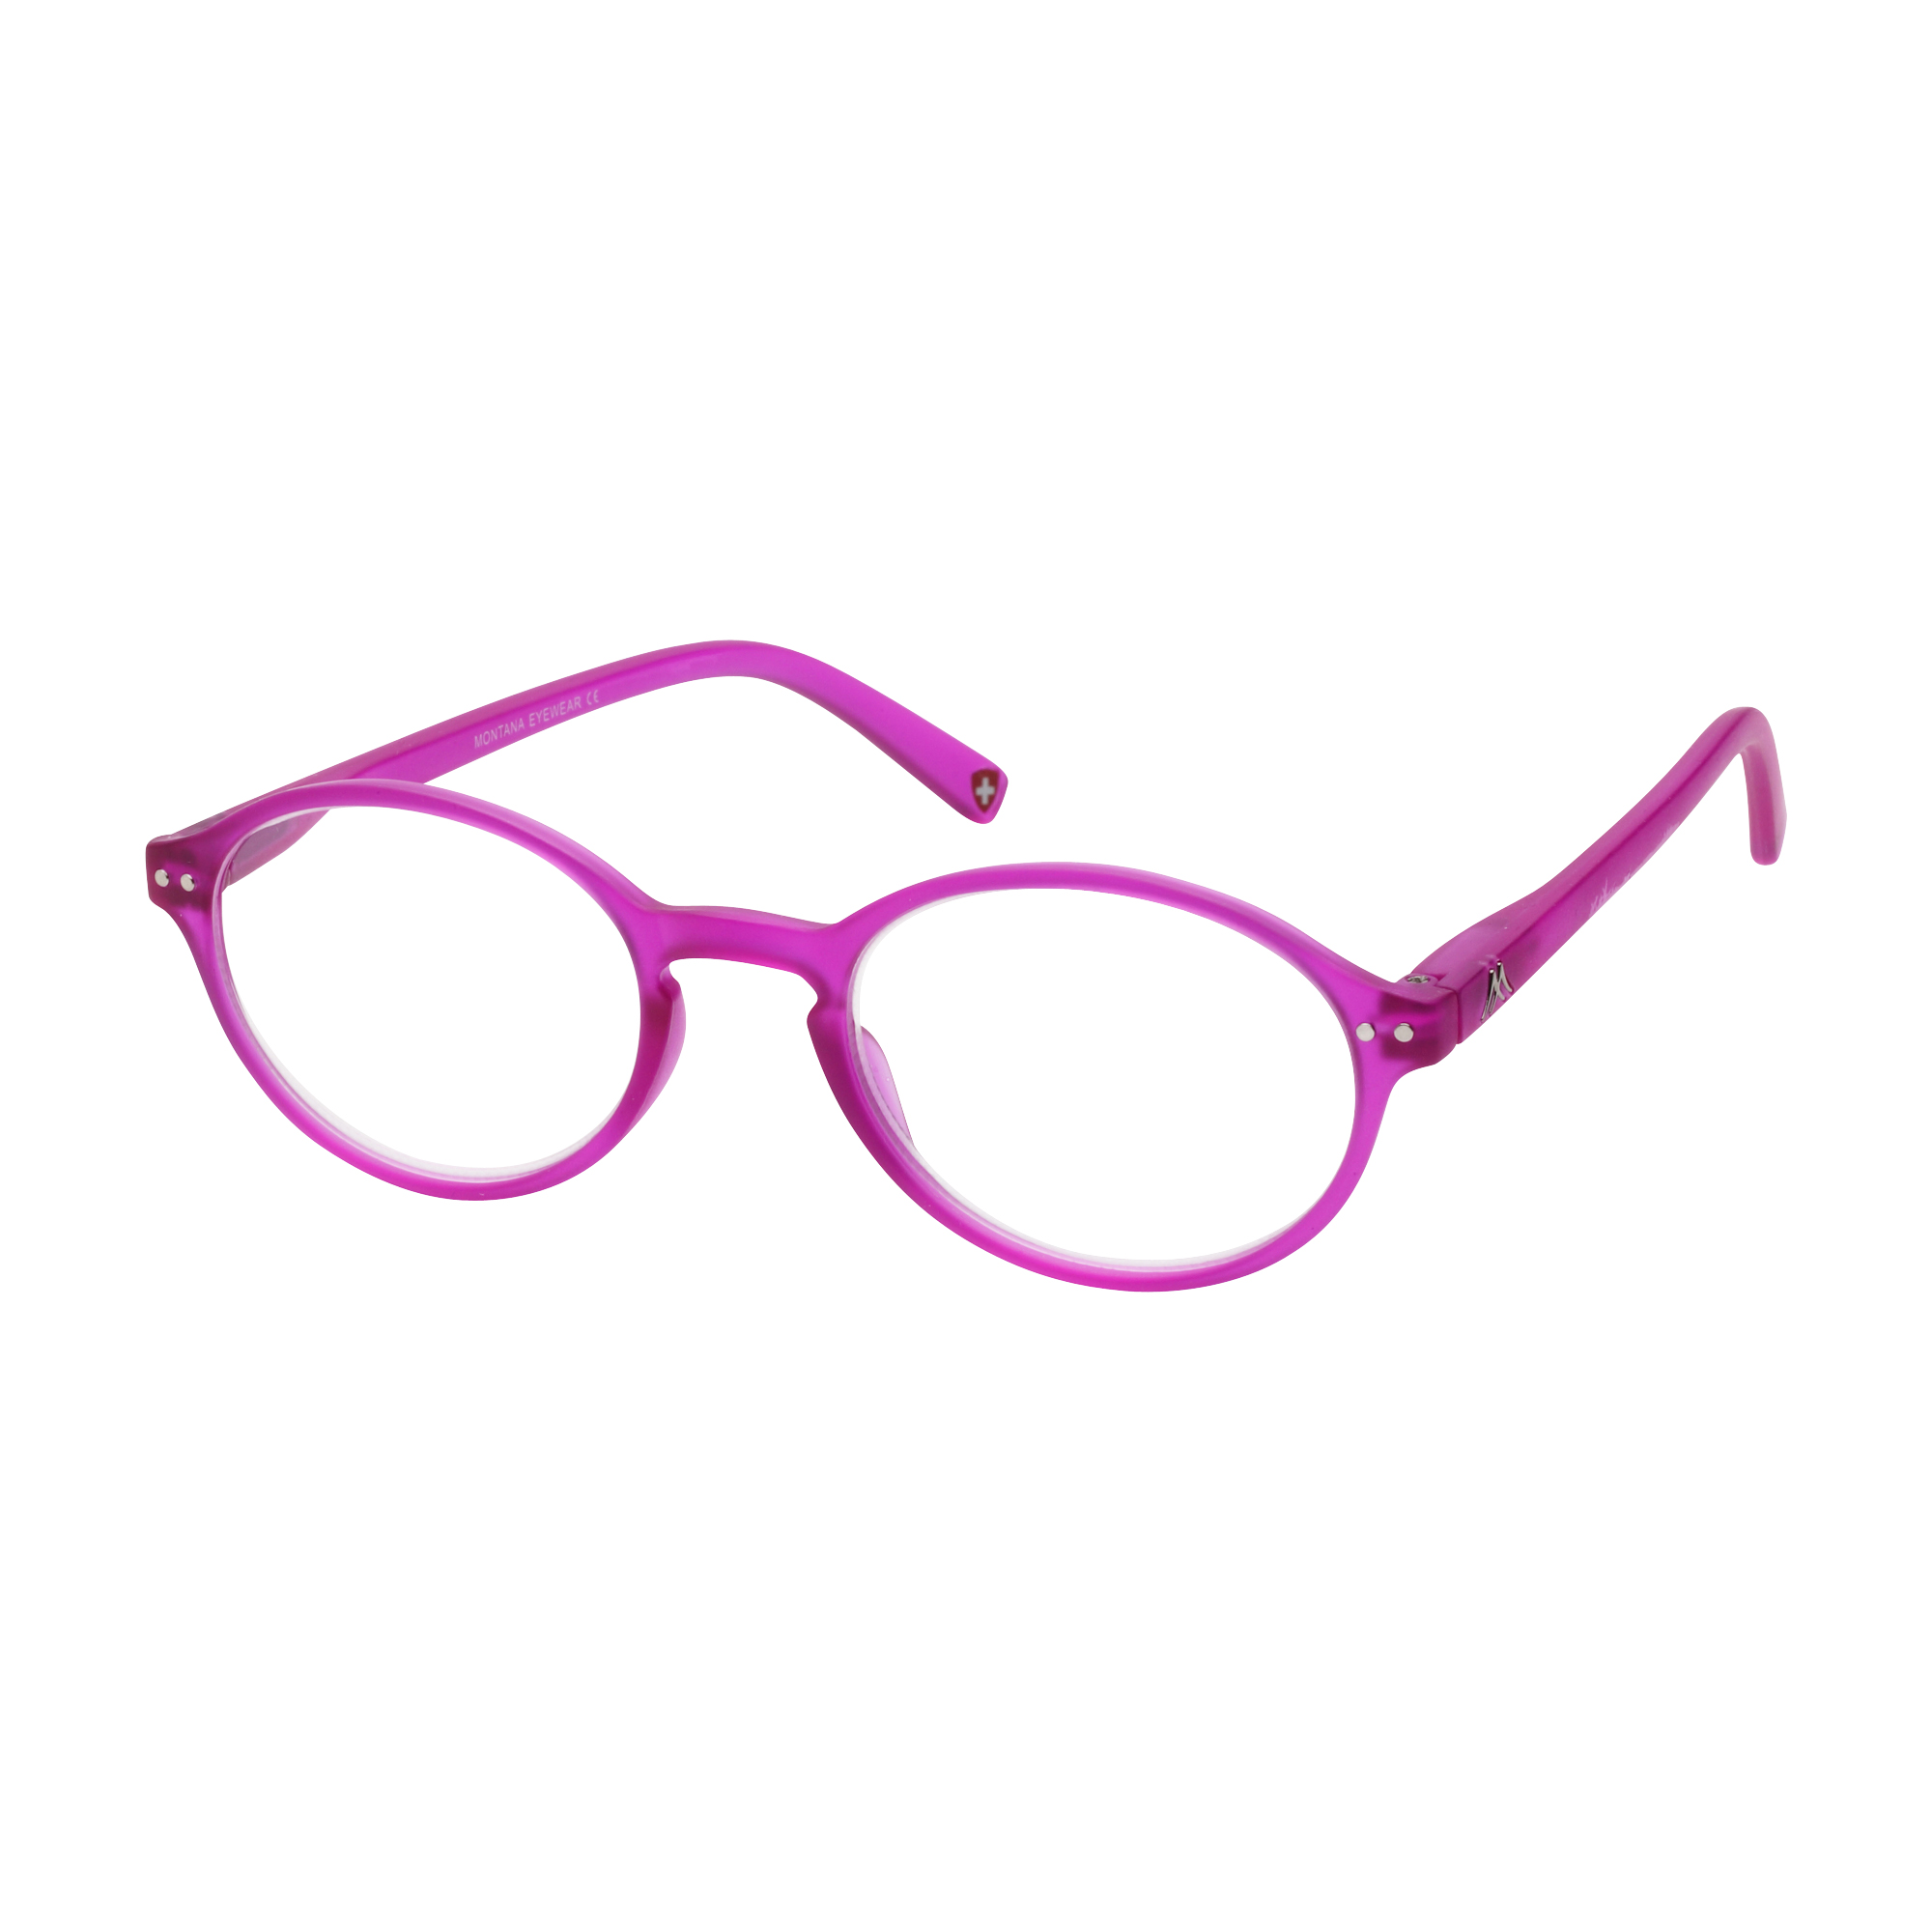 women's reading glasses funky off 20   sietelecom.com